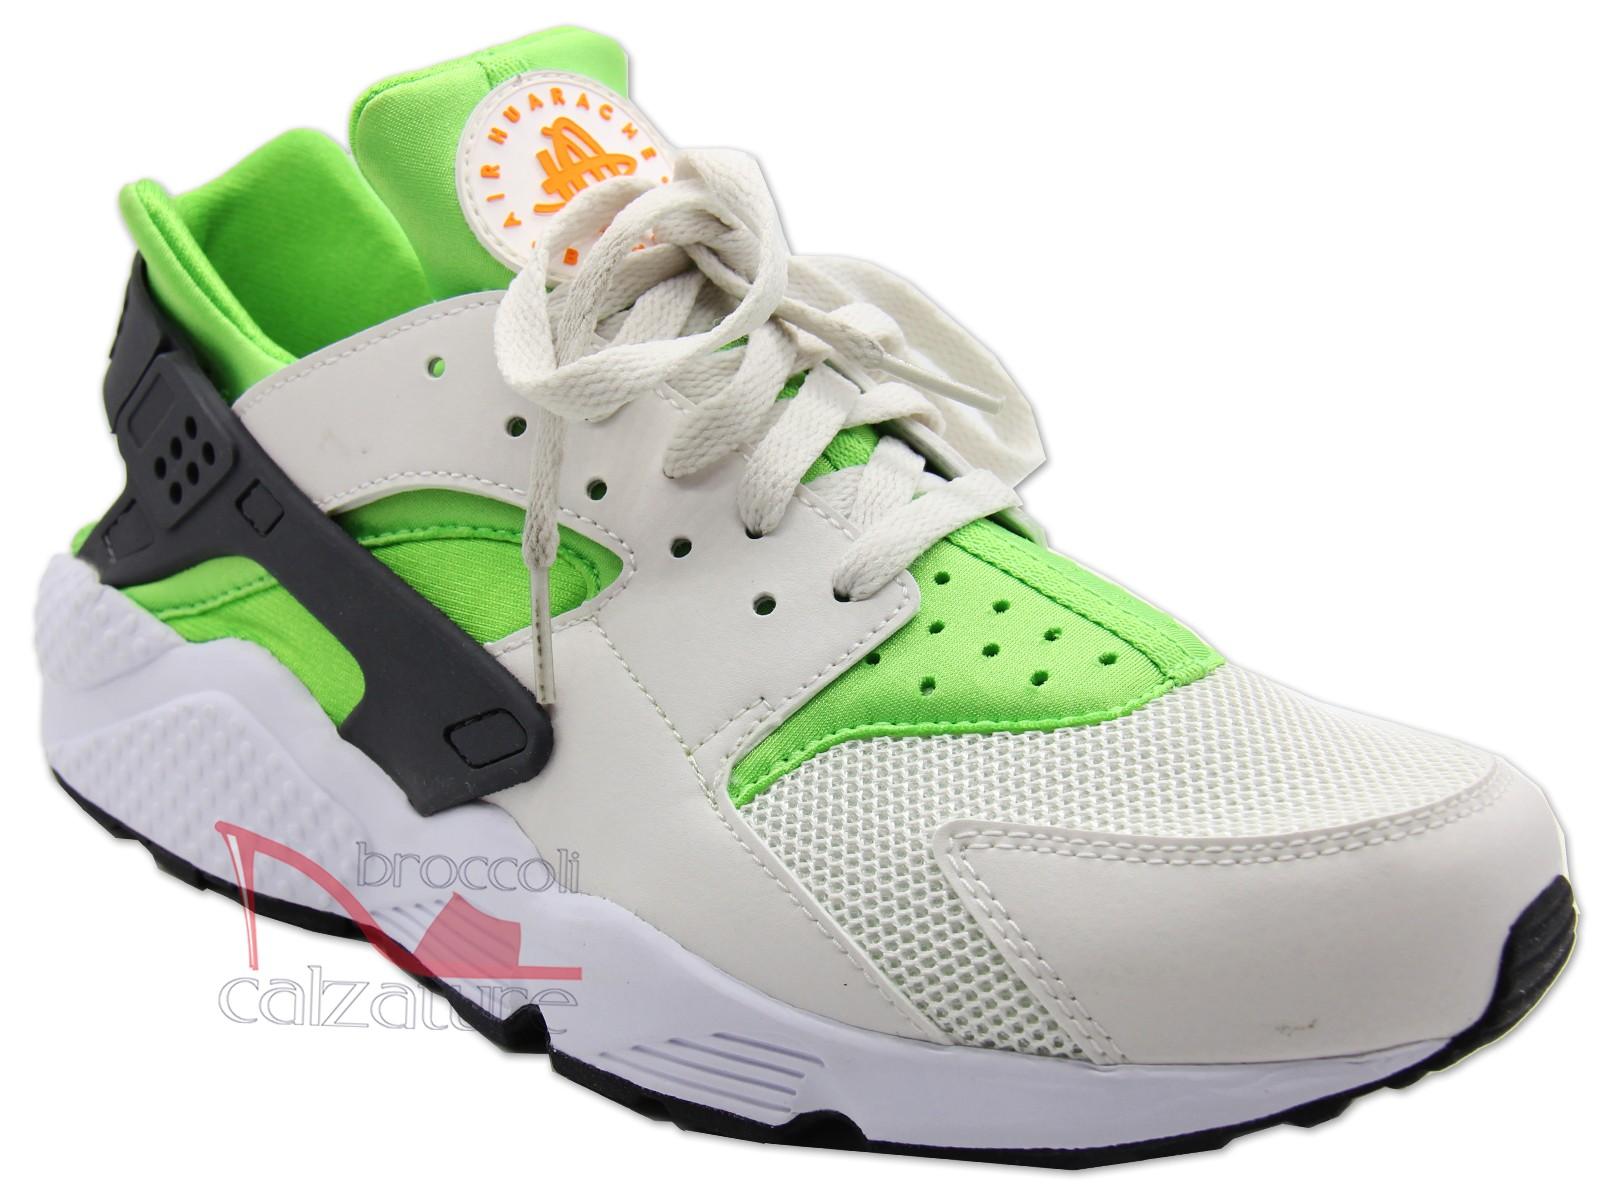 SCARPA DA CORSA NIKE HUARACHE Nike scarpe corsa uomo